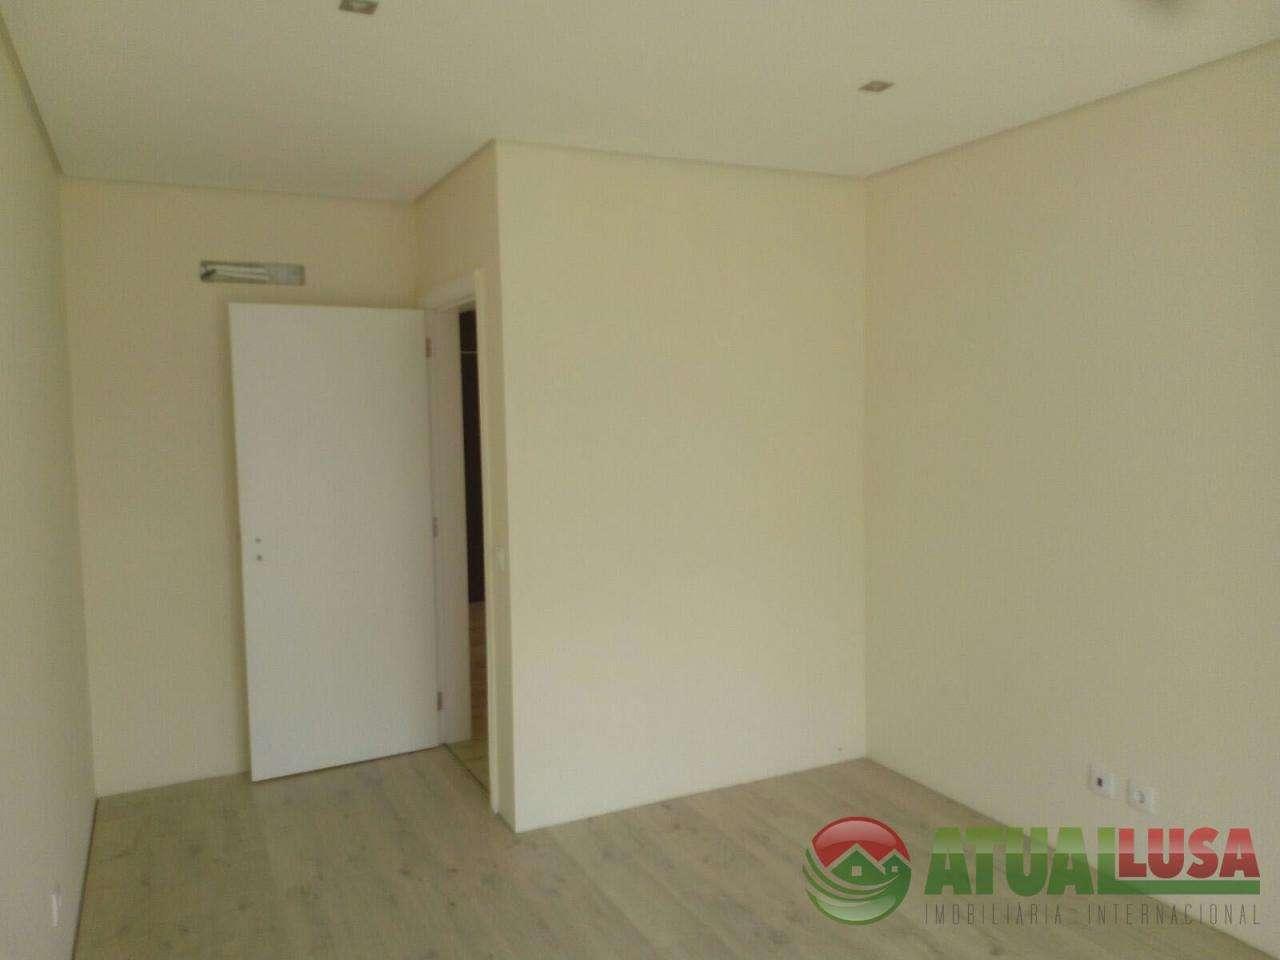 Apartamento para comprar, Carcavelos e Parede, Cascais, Lisboa - Foto 3